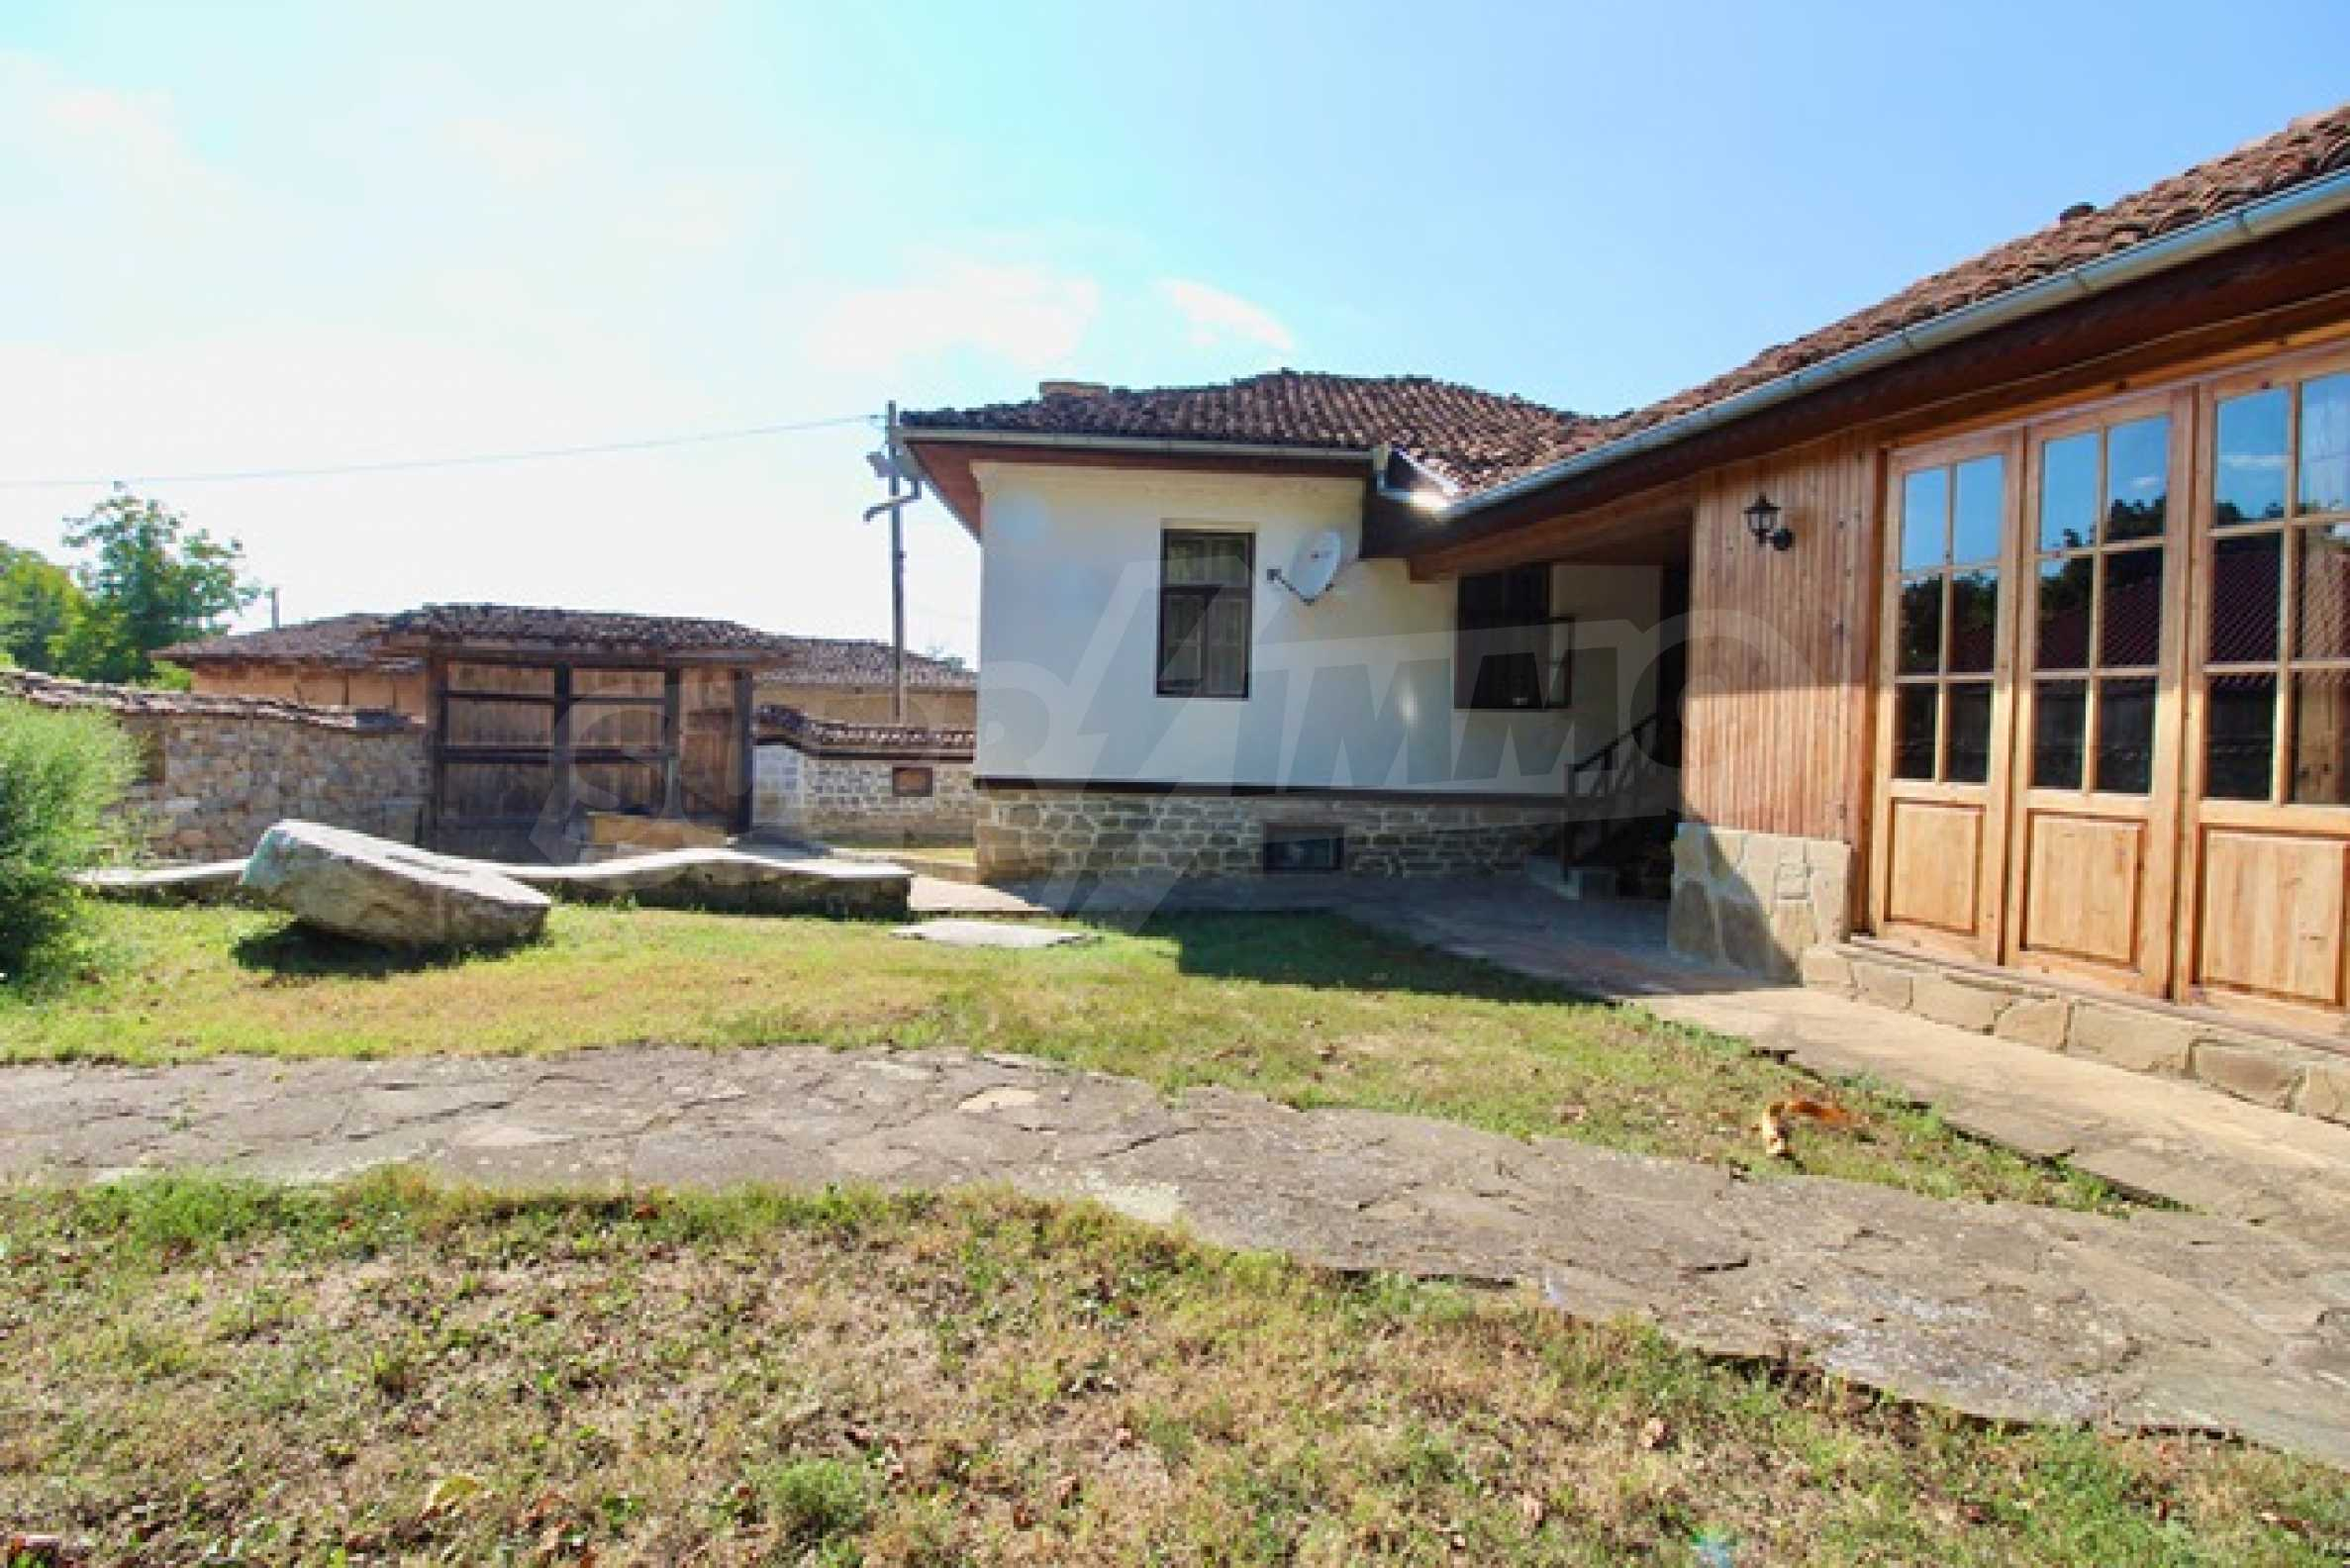 Lovely old house just 17 km away from Veliko Tarnovo 18